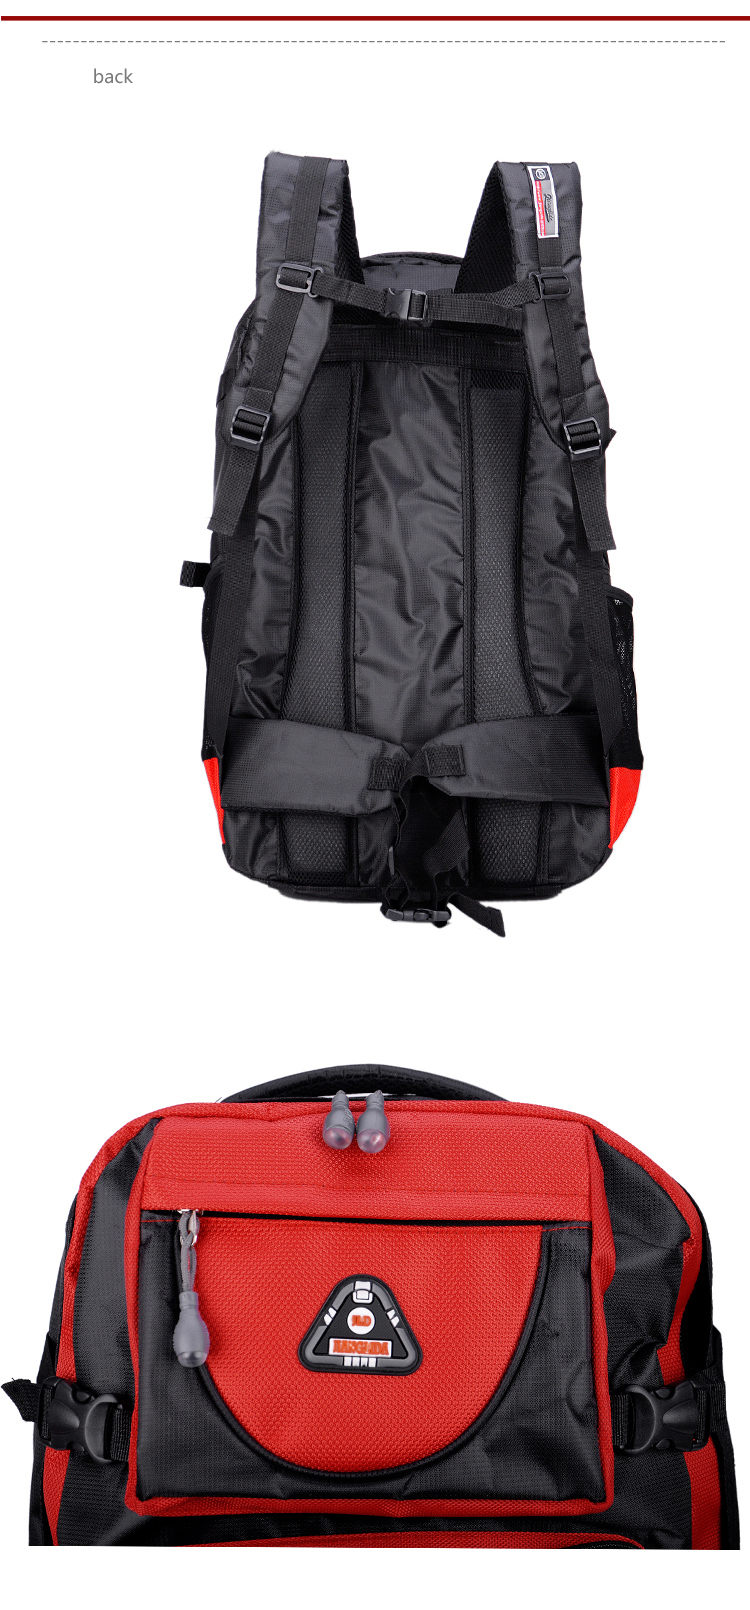 17 Senkey style 60L Large-capacity Travel Backpack Men Women Fashion Backpack To Casual Waterproof Laptop Student school Bag 6